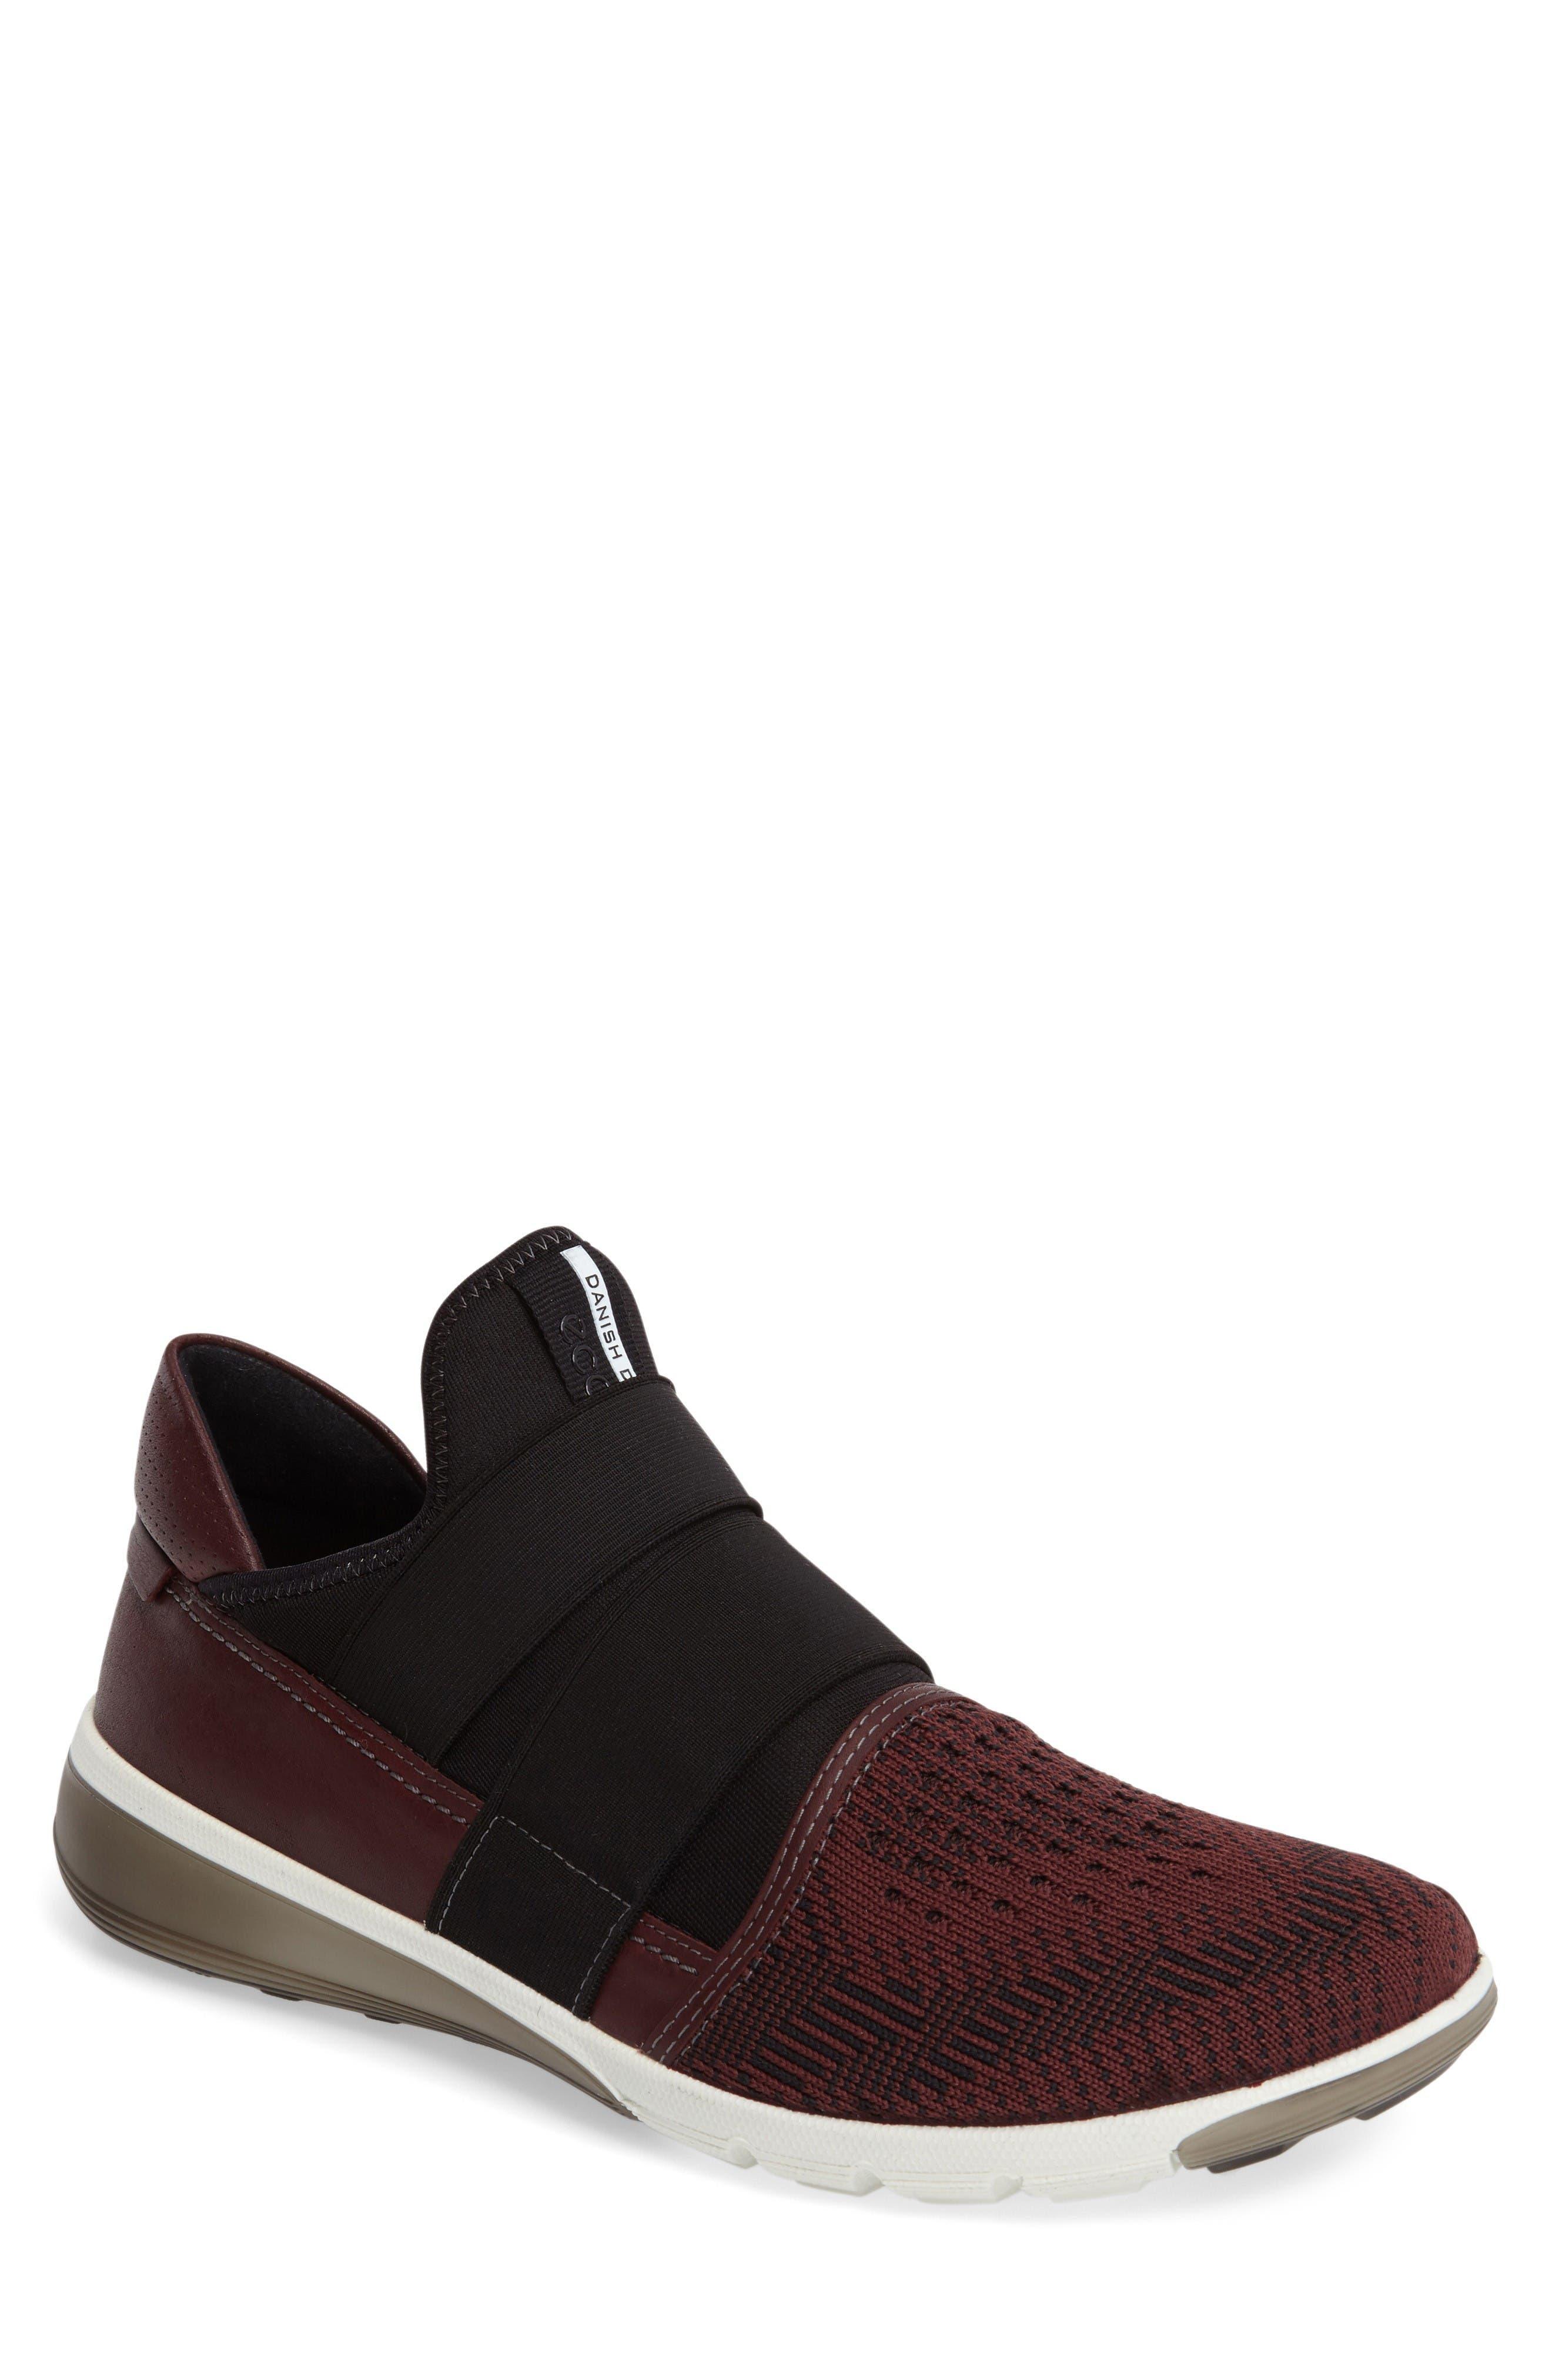 Alternate Image 1 Selected - ECCO 'Intrinsic' Sneaker (Men)